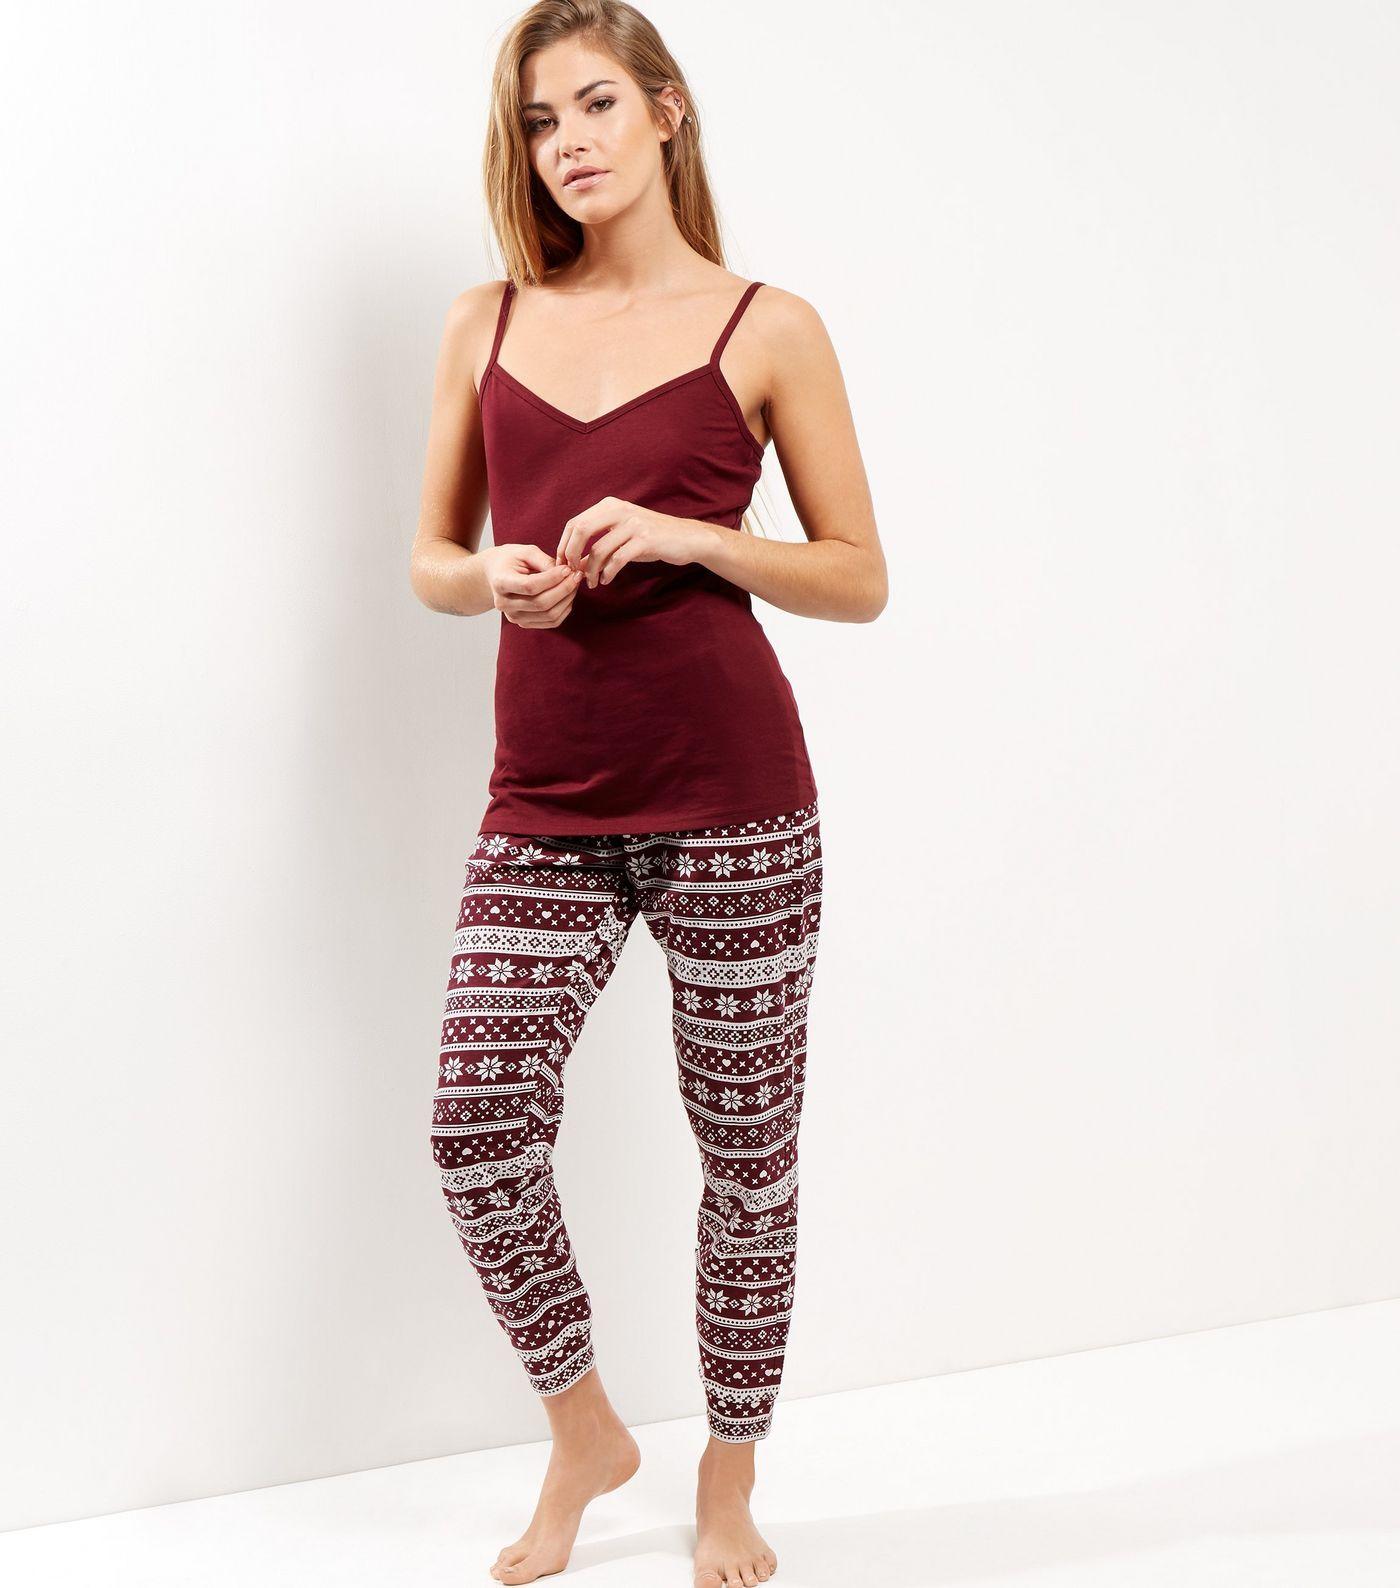 4927838409a New Look - Petite - Fairisle Pyjama Set in burgundy